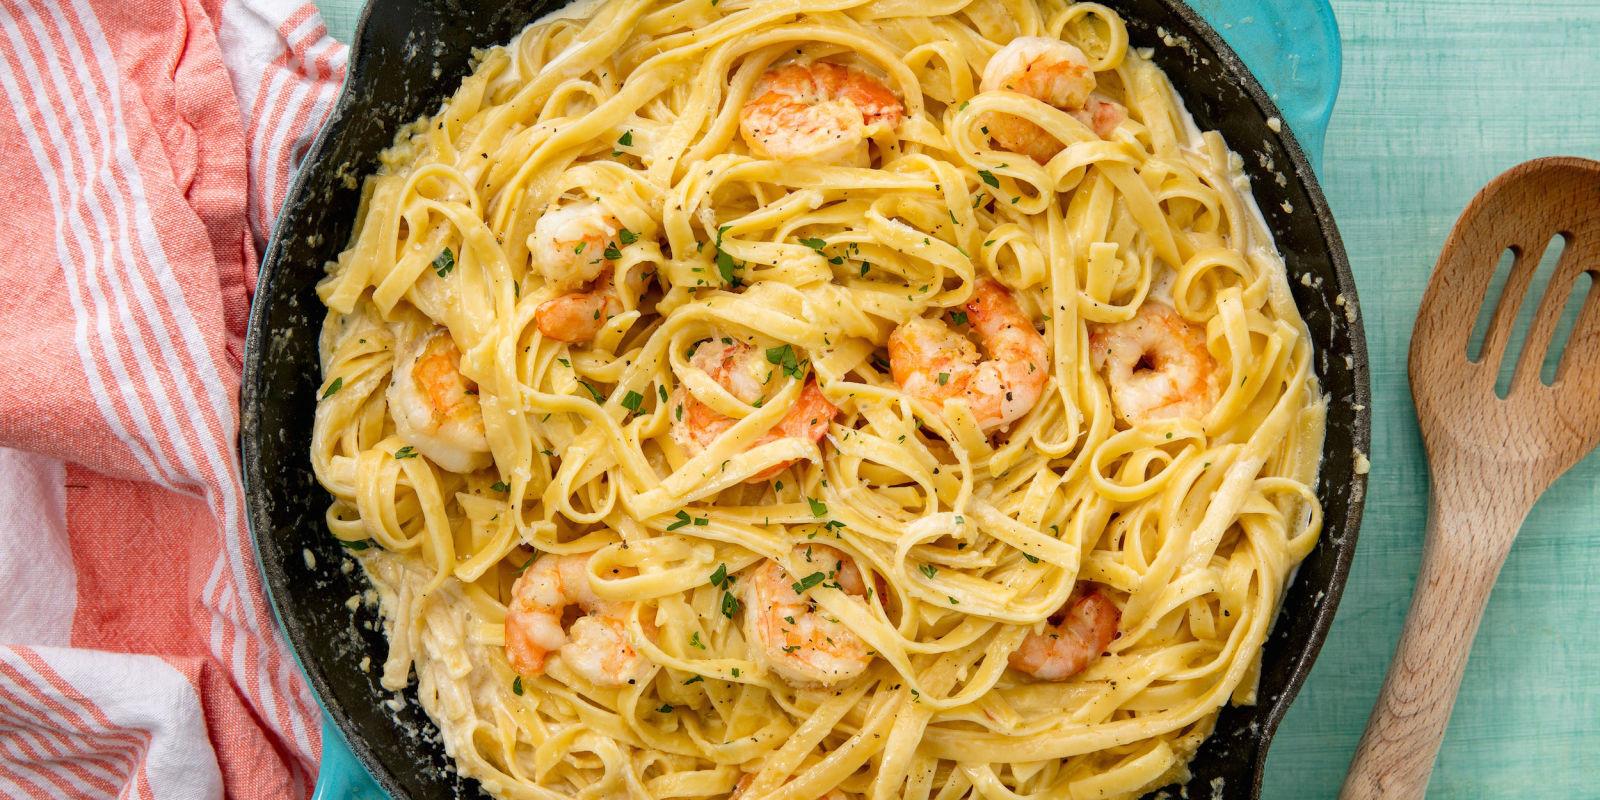 Shrimp Spaghetti Alfredo  Easy Shrimp Alfredo Fettuccine Recipe How to Make Shrimp